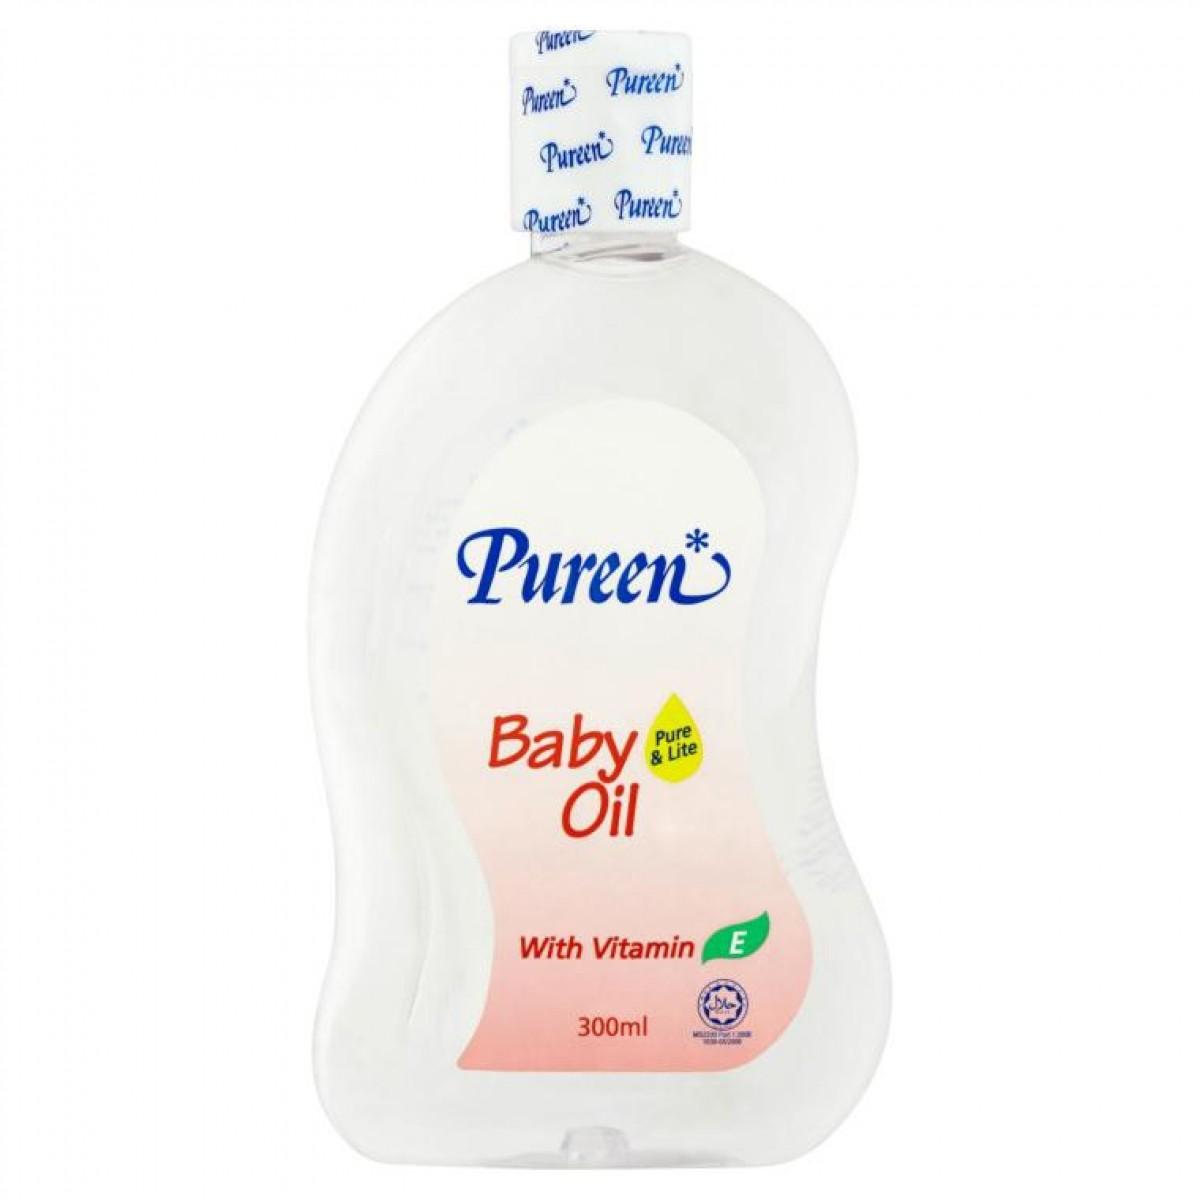 Pureen Baby Oil (300ml) - Kico Baby Center